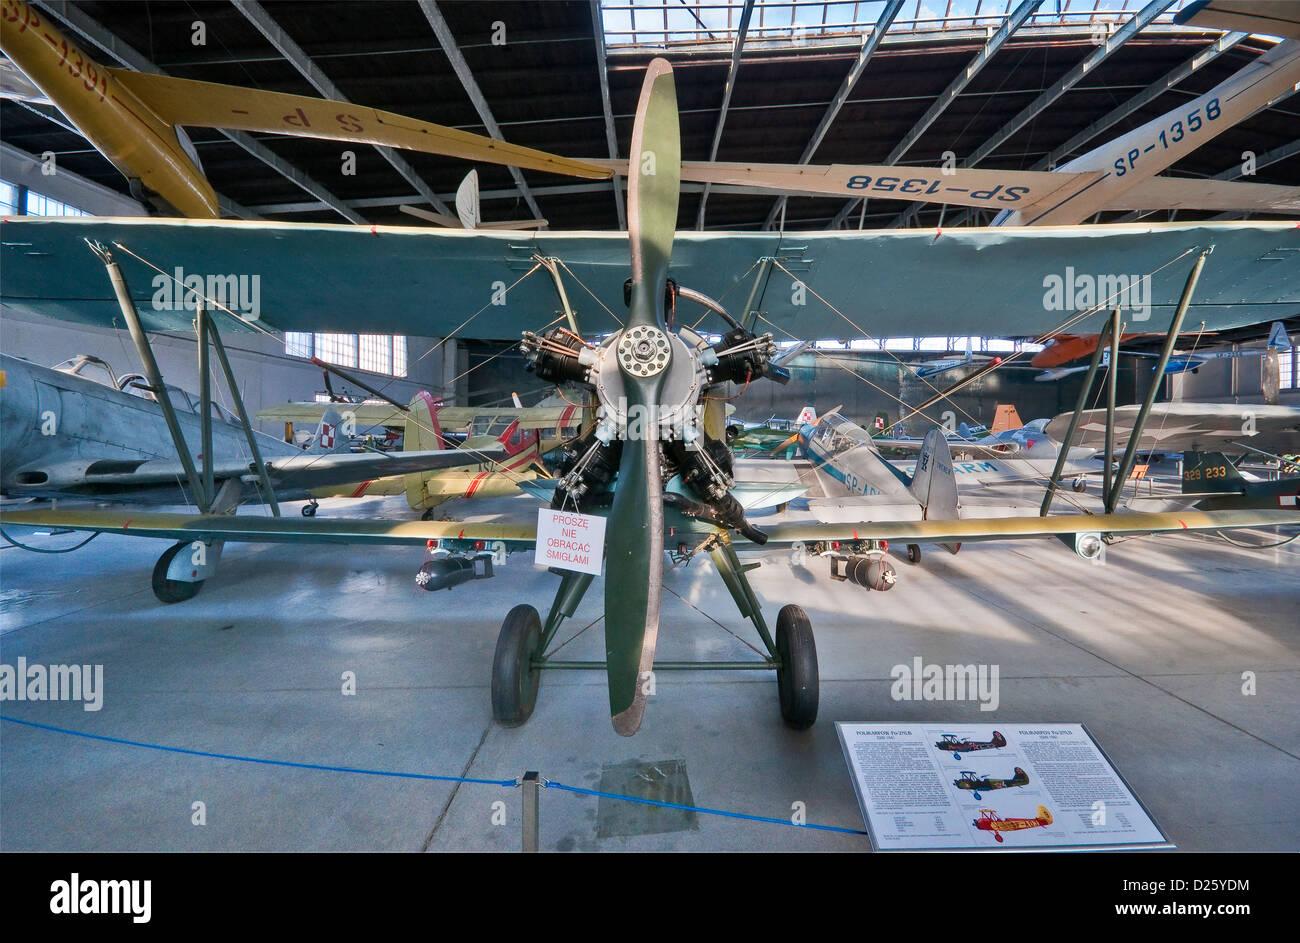 Polikarpov Po-2, WW2 general-purpose Soviet biplane, Polish Aviation Museum in Krakow, Poland - Stock Image